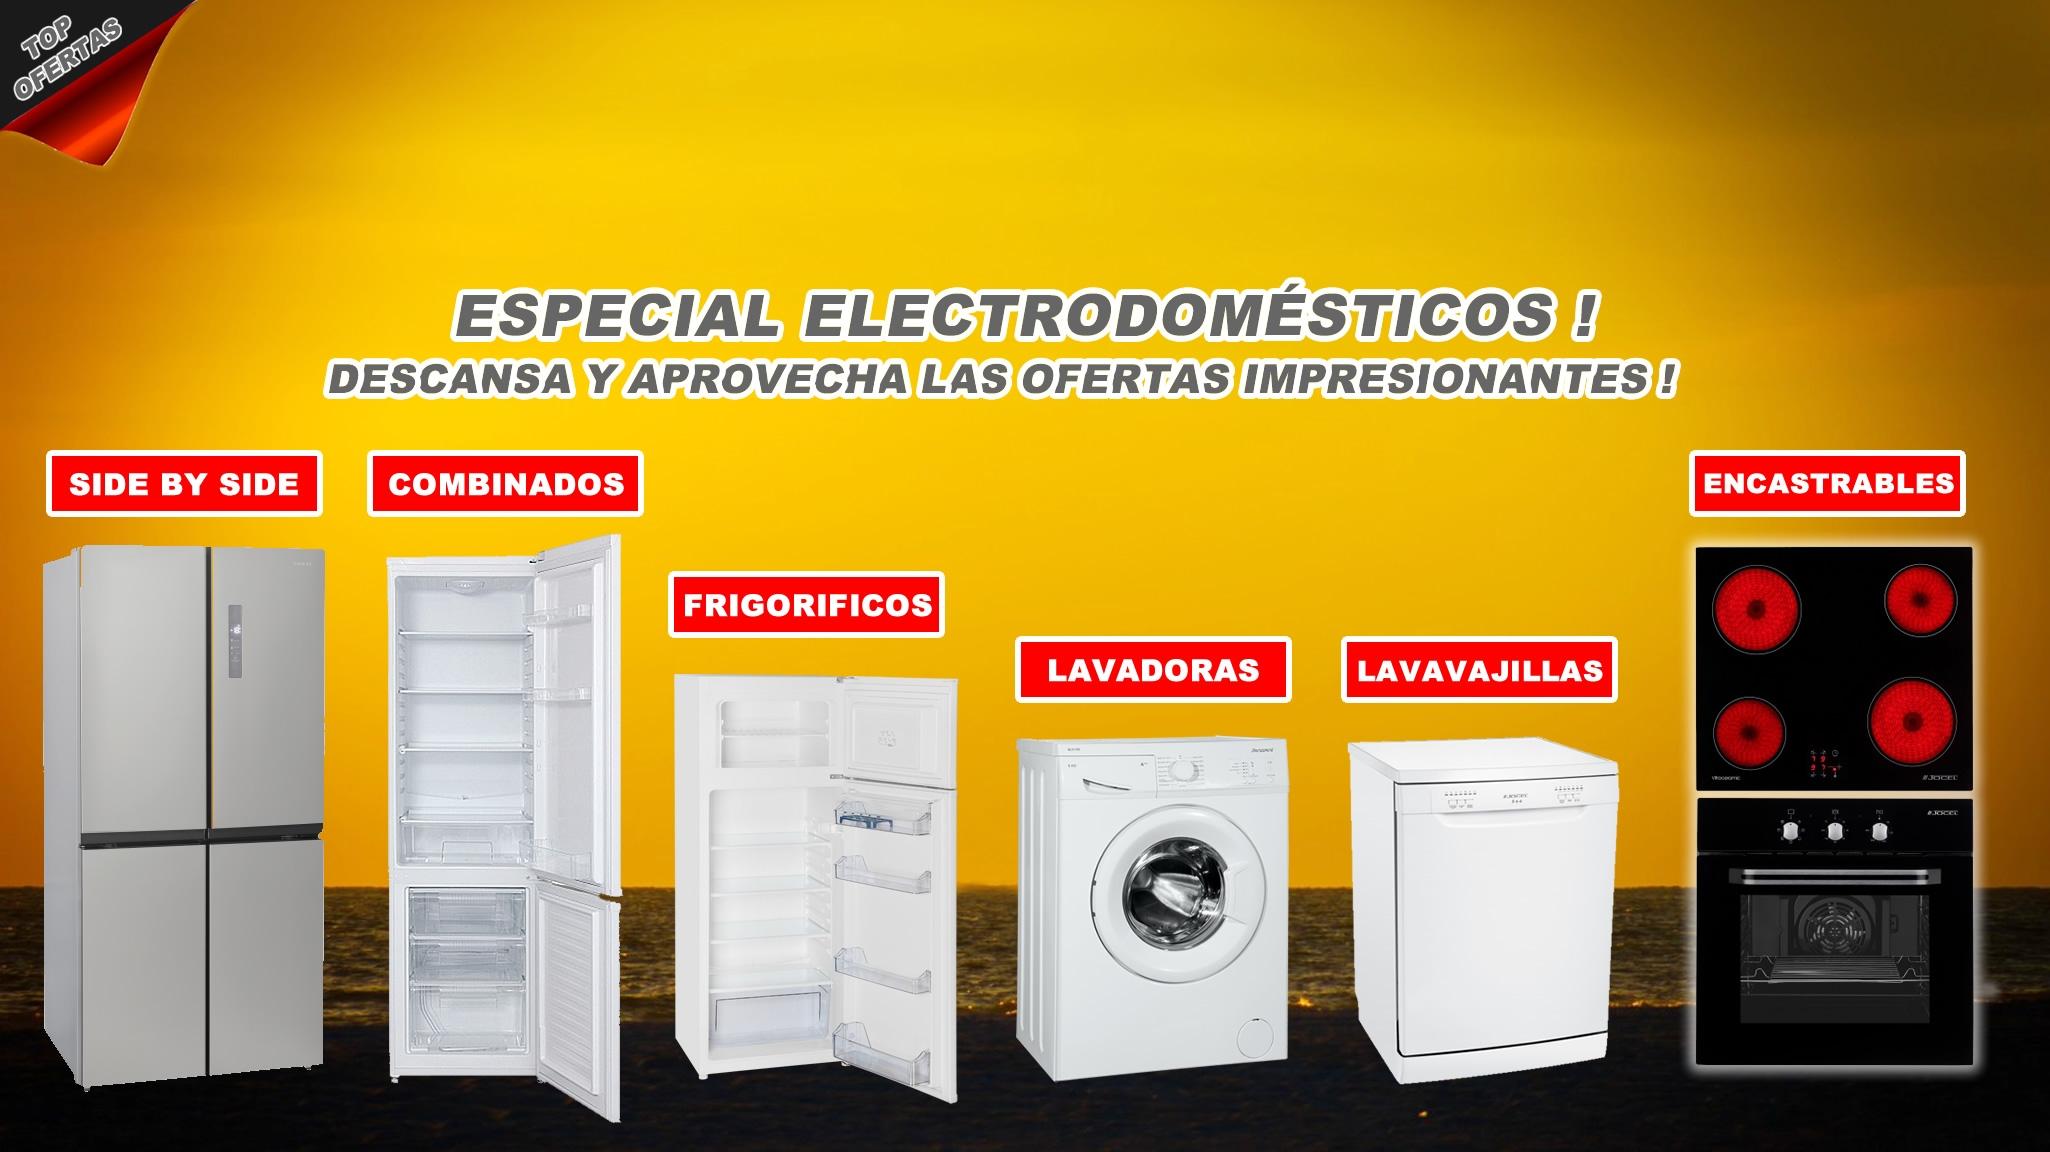 oferta electrodomesticos neveras frigorificos side by side figueres girona